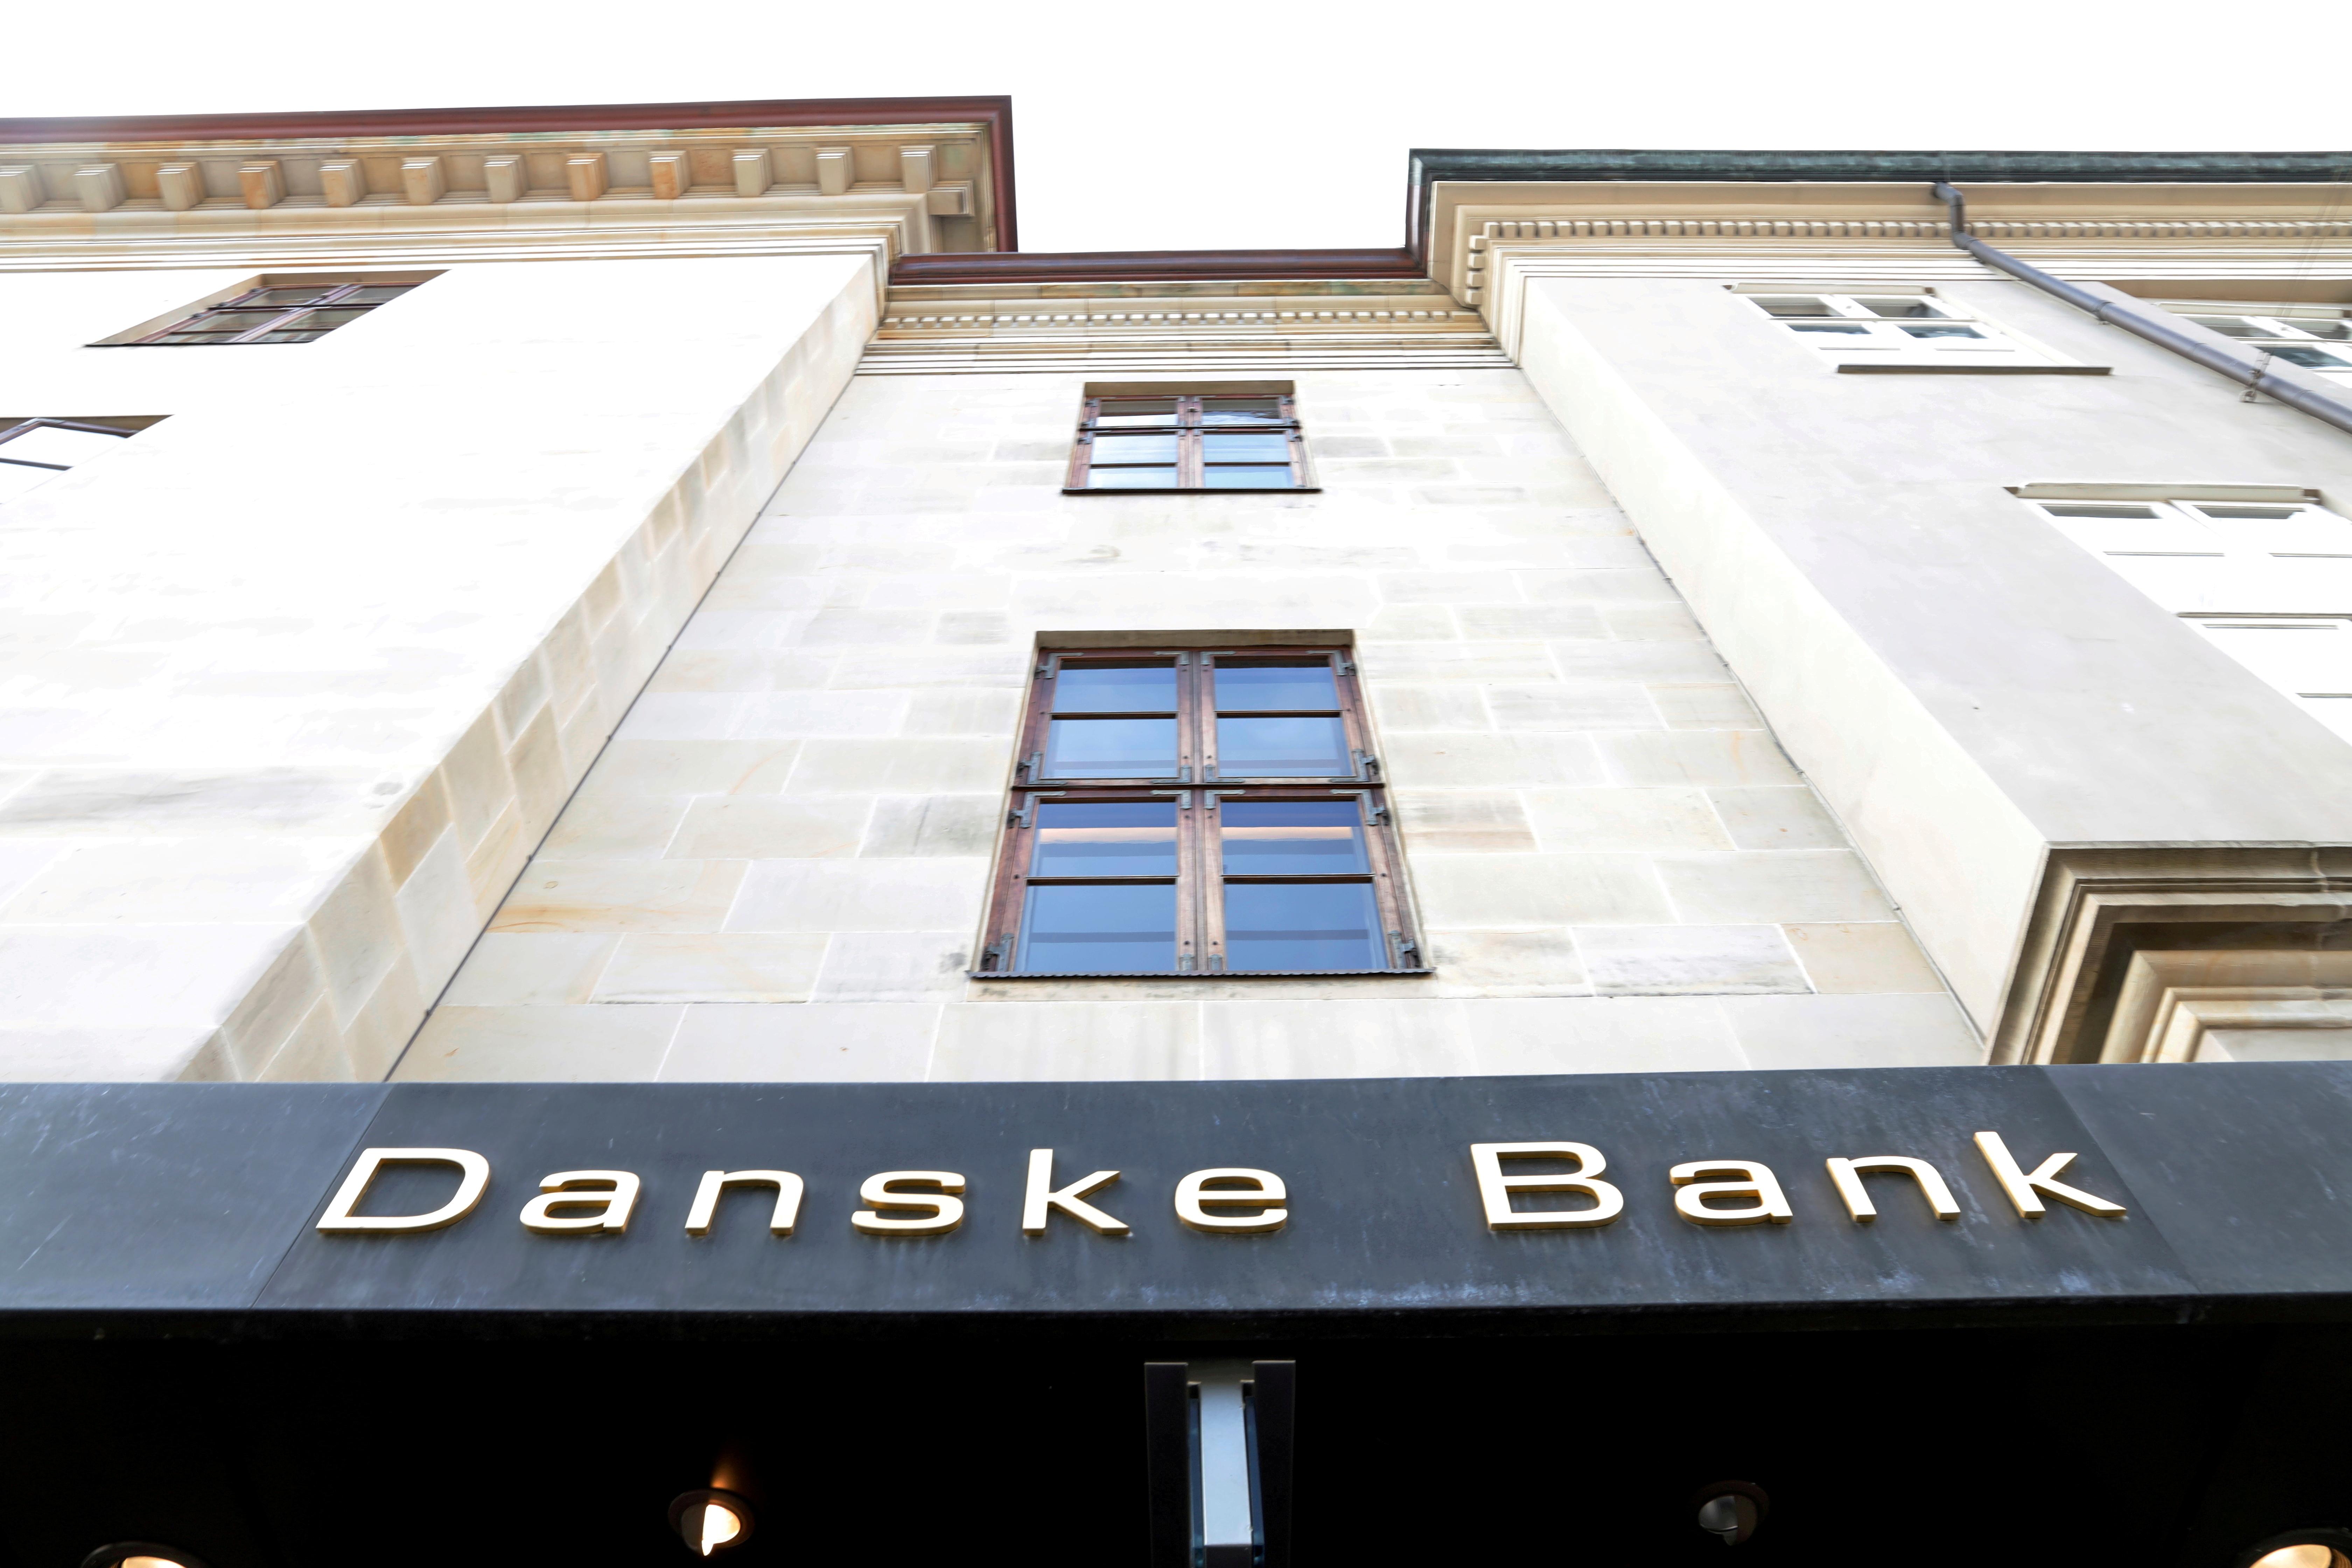 A Danske bank sign is seen on a bank's headquarters in Copenhagen, Denmark October 22, 2019. REUTERS/Jacob Gronholt-Pedersen